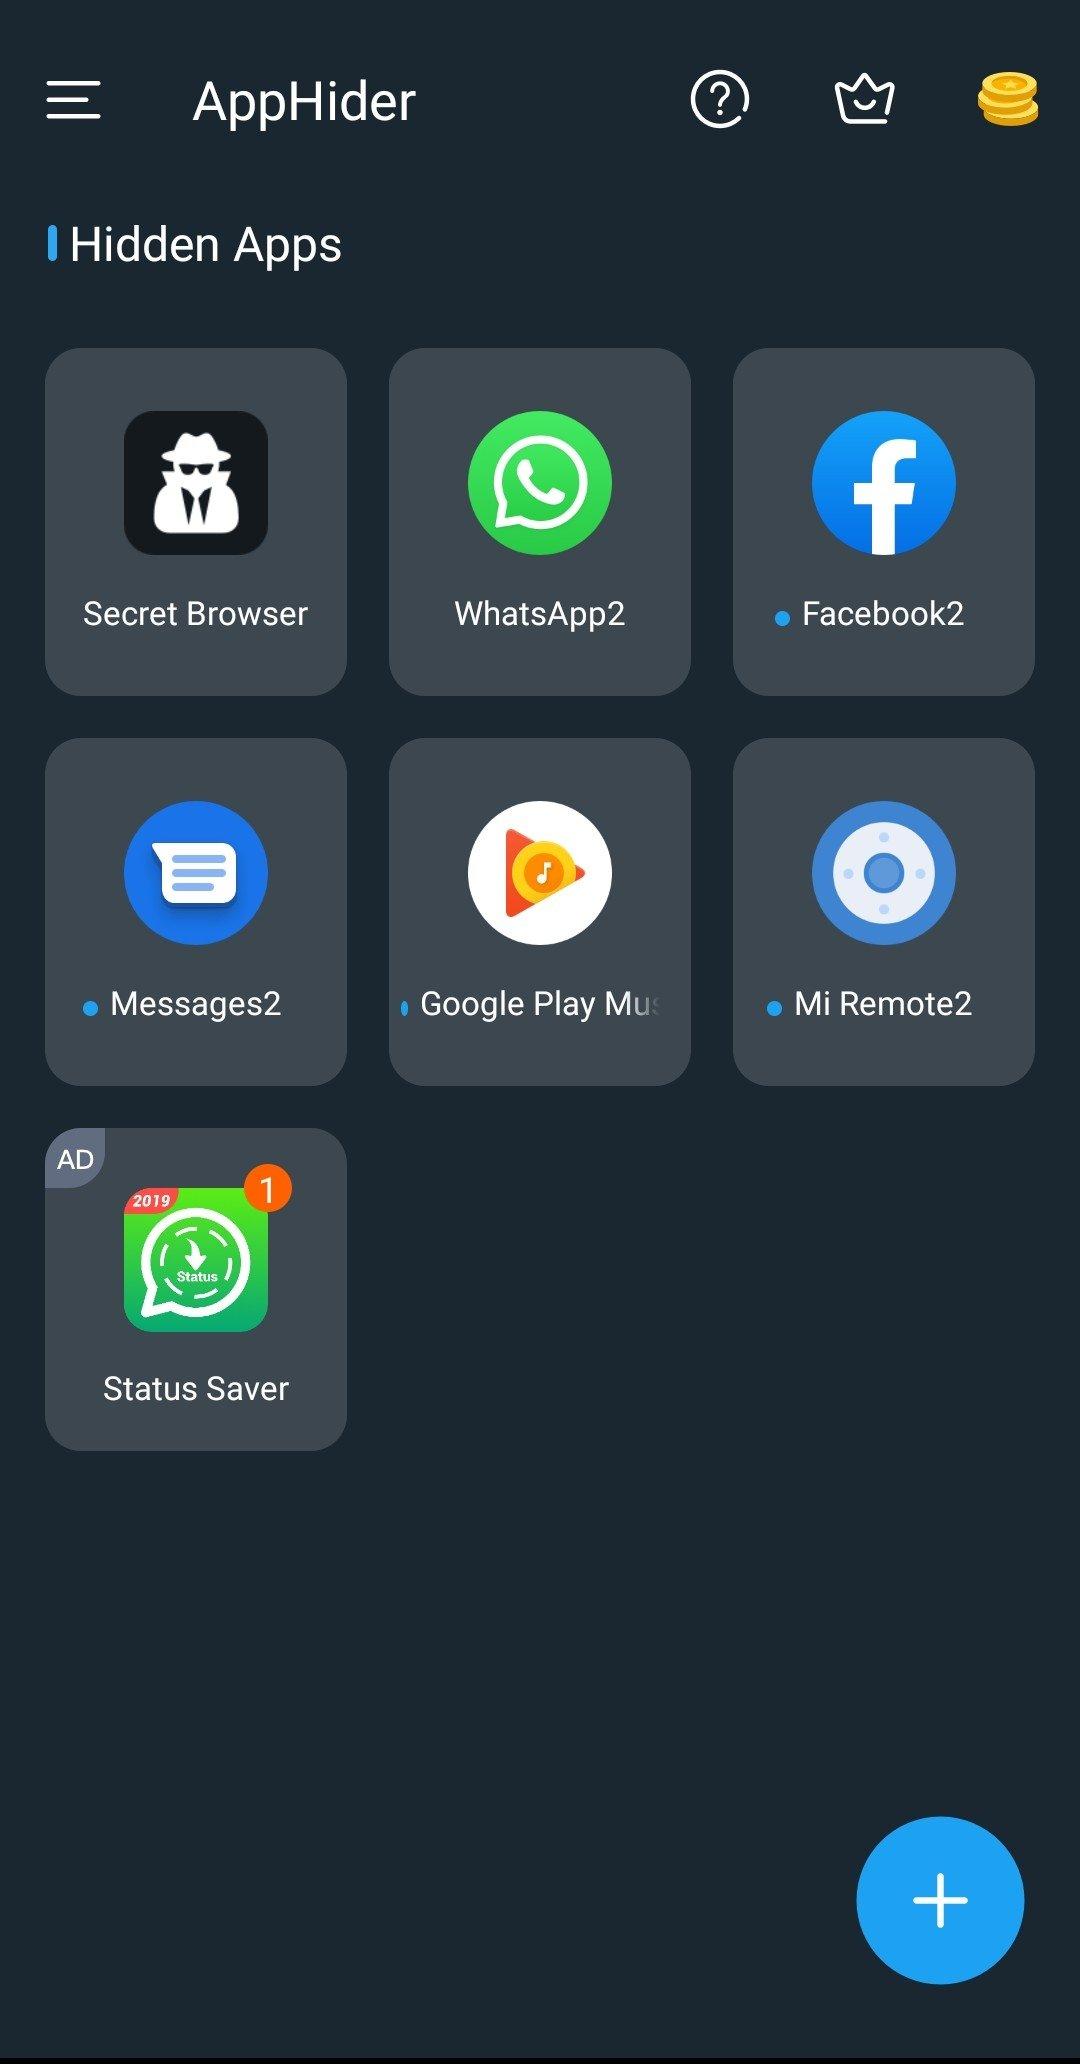 Hide Apps 1.3.04 - Download per Android APK Gratis